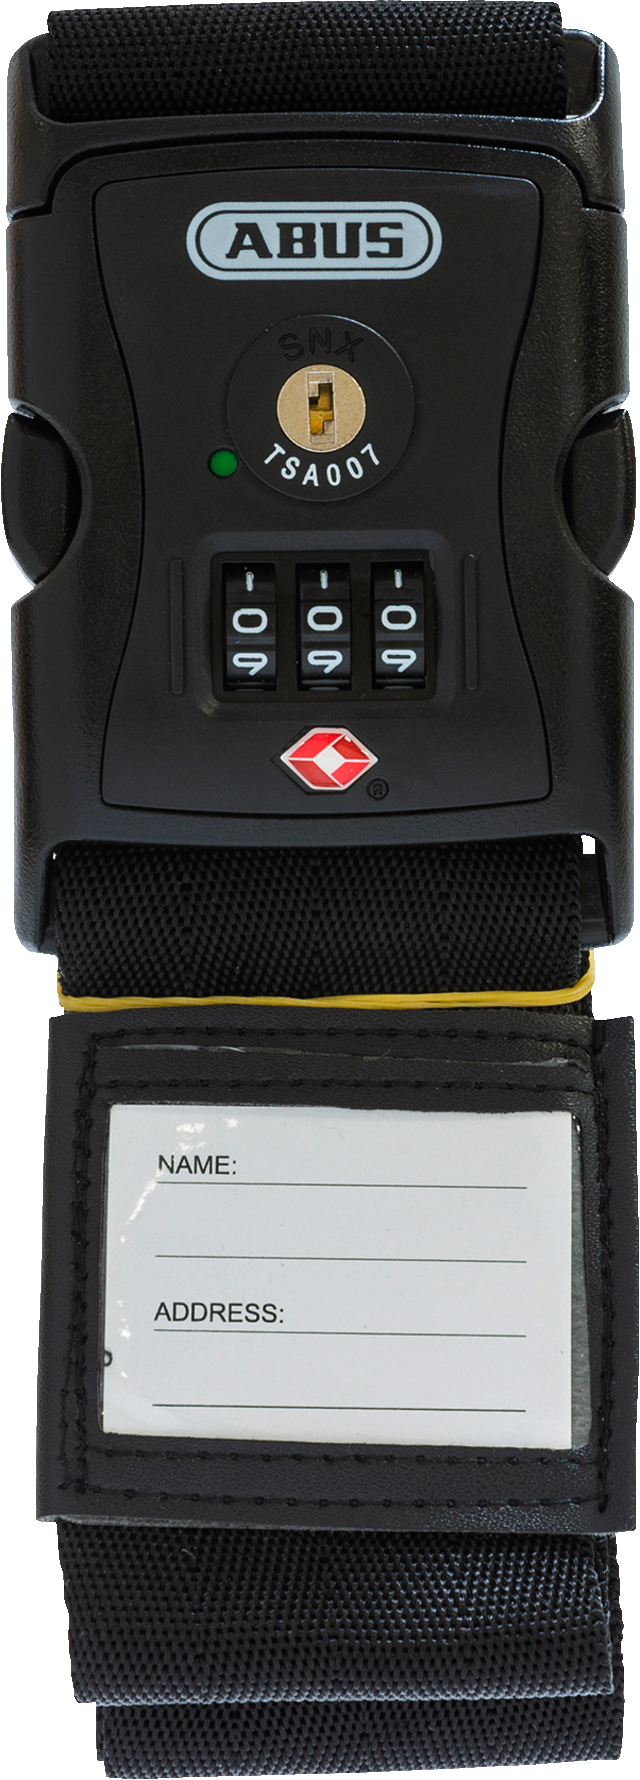 Kofferband 620TSA/192 schwarz luggage strap lock